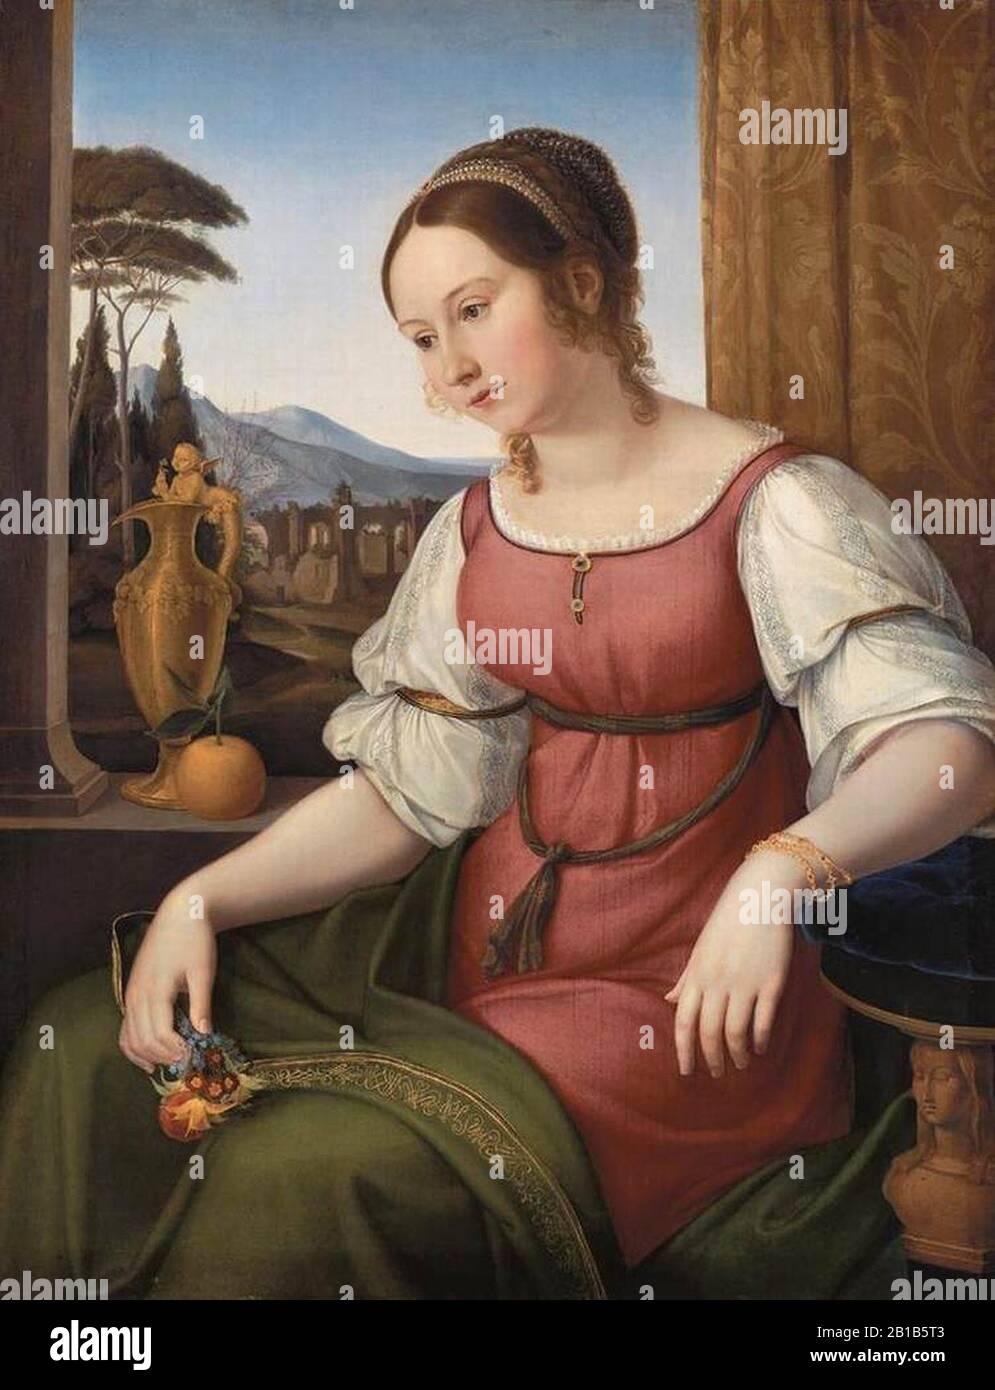 Friedrich Wilhelm Von Schadow - Portrait D'Une Jeune Femme Romaine (Angelina Magtti) - Banque D'Images